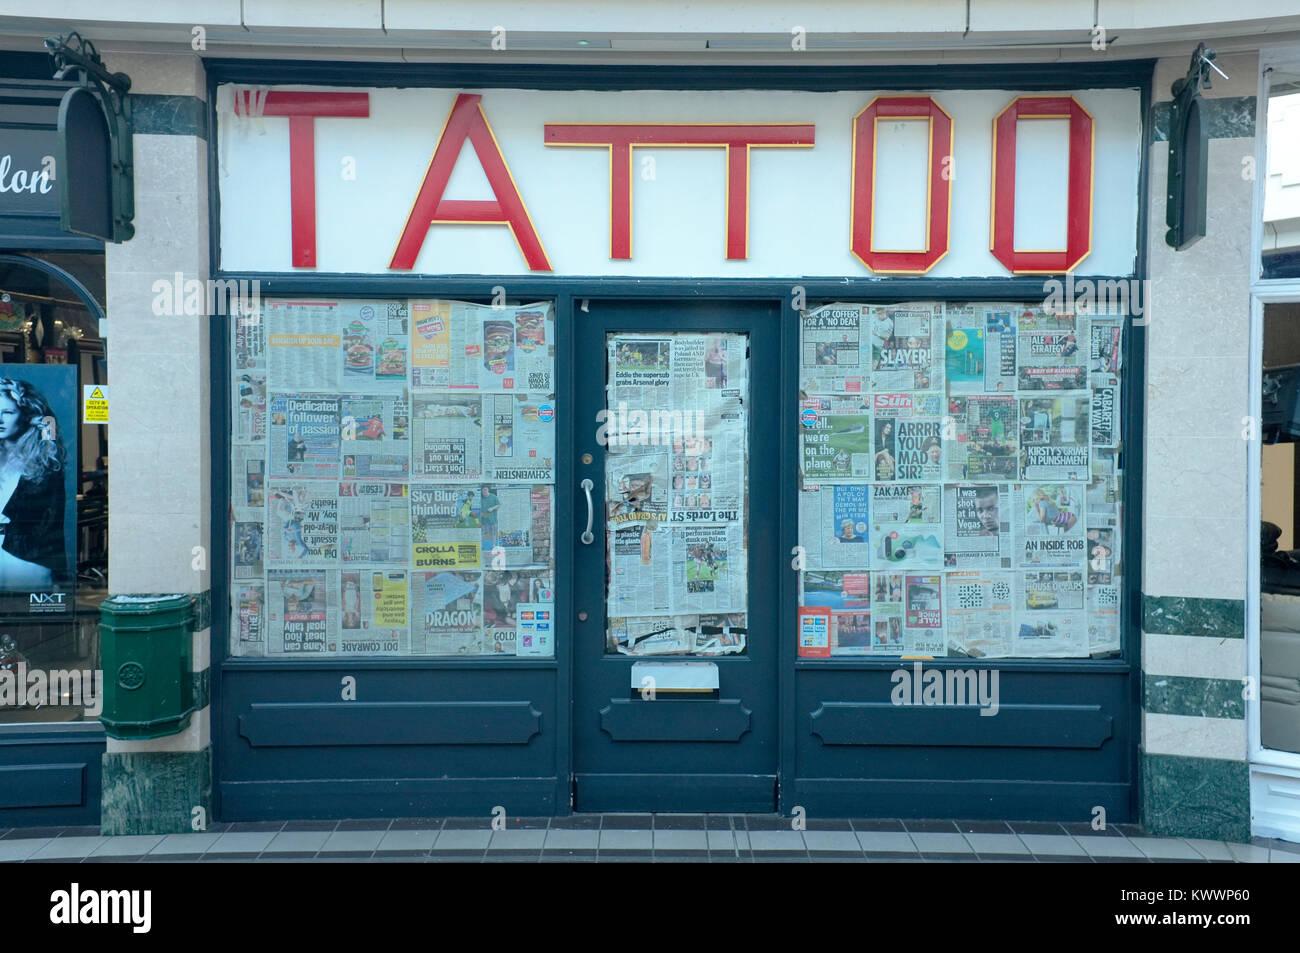 Tattoo Shop Stock Photos & Tattoo Shop Stock Images - Alamy